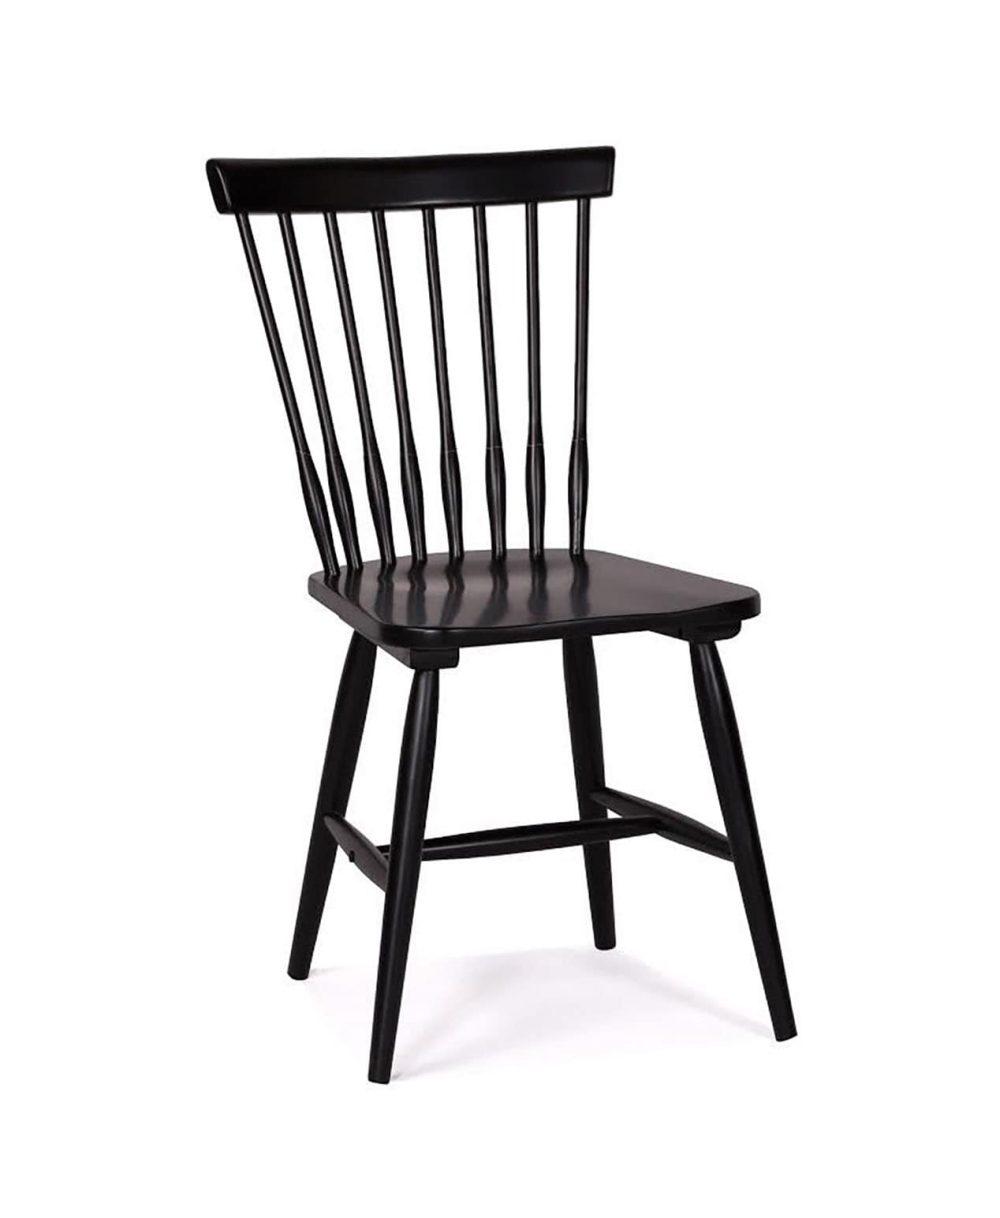 Tarno Chair